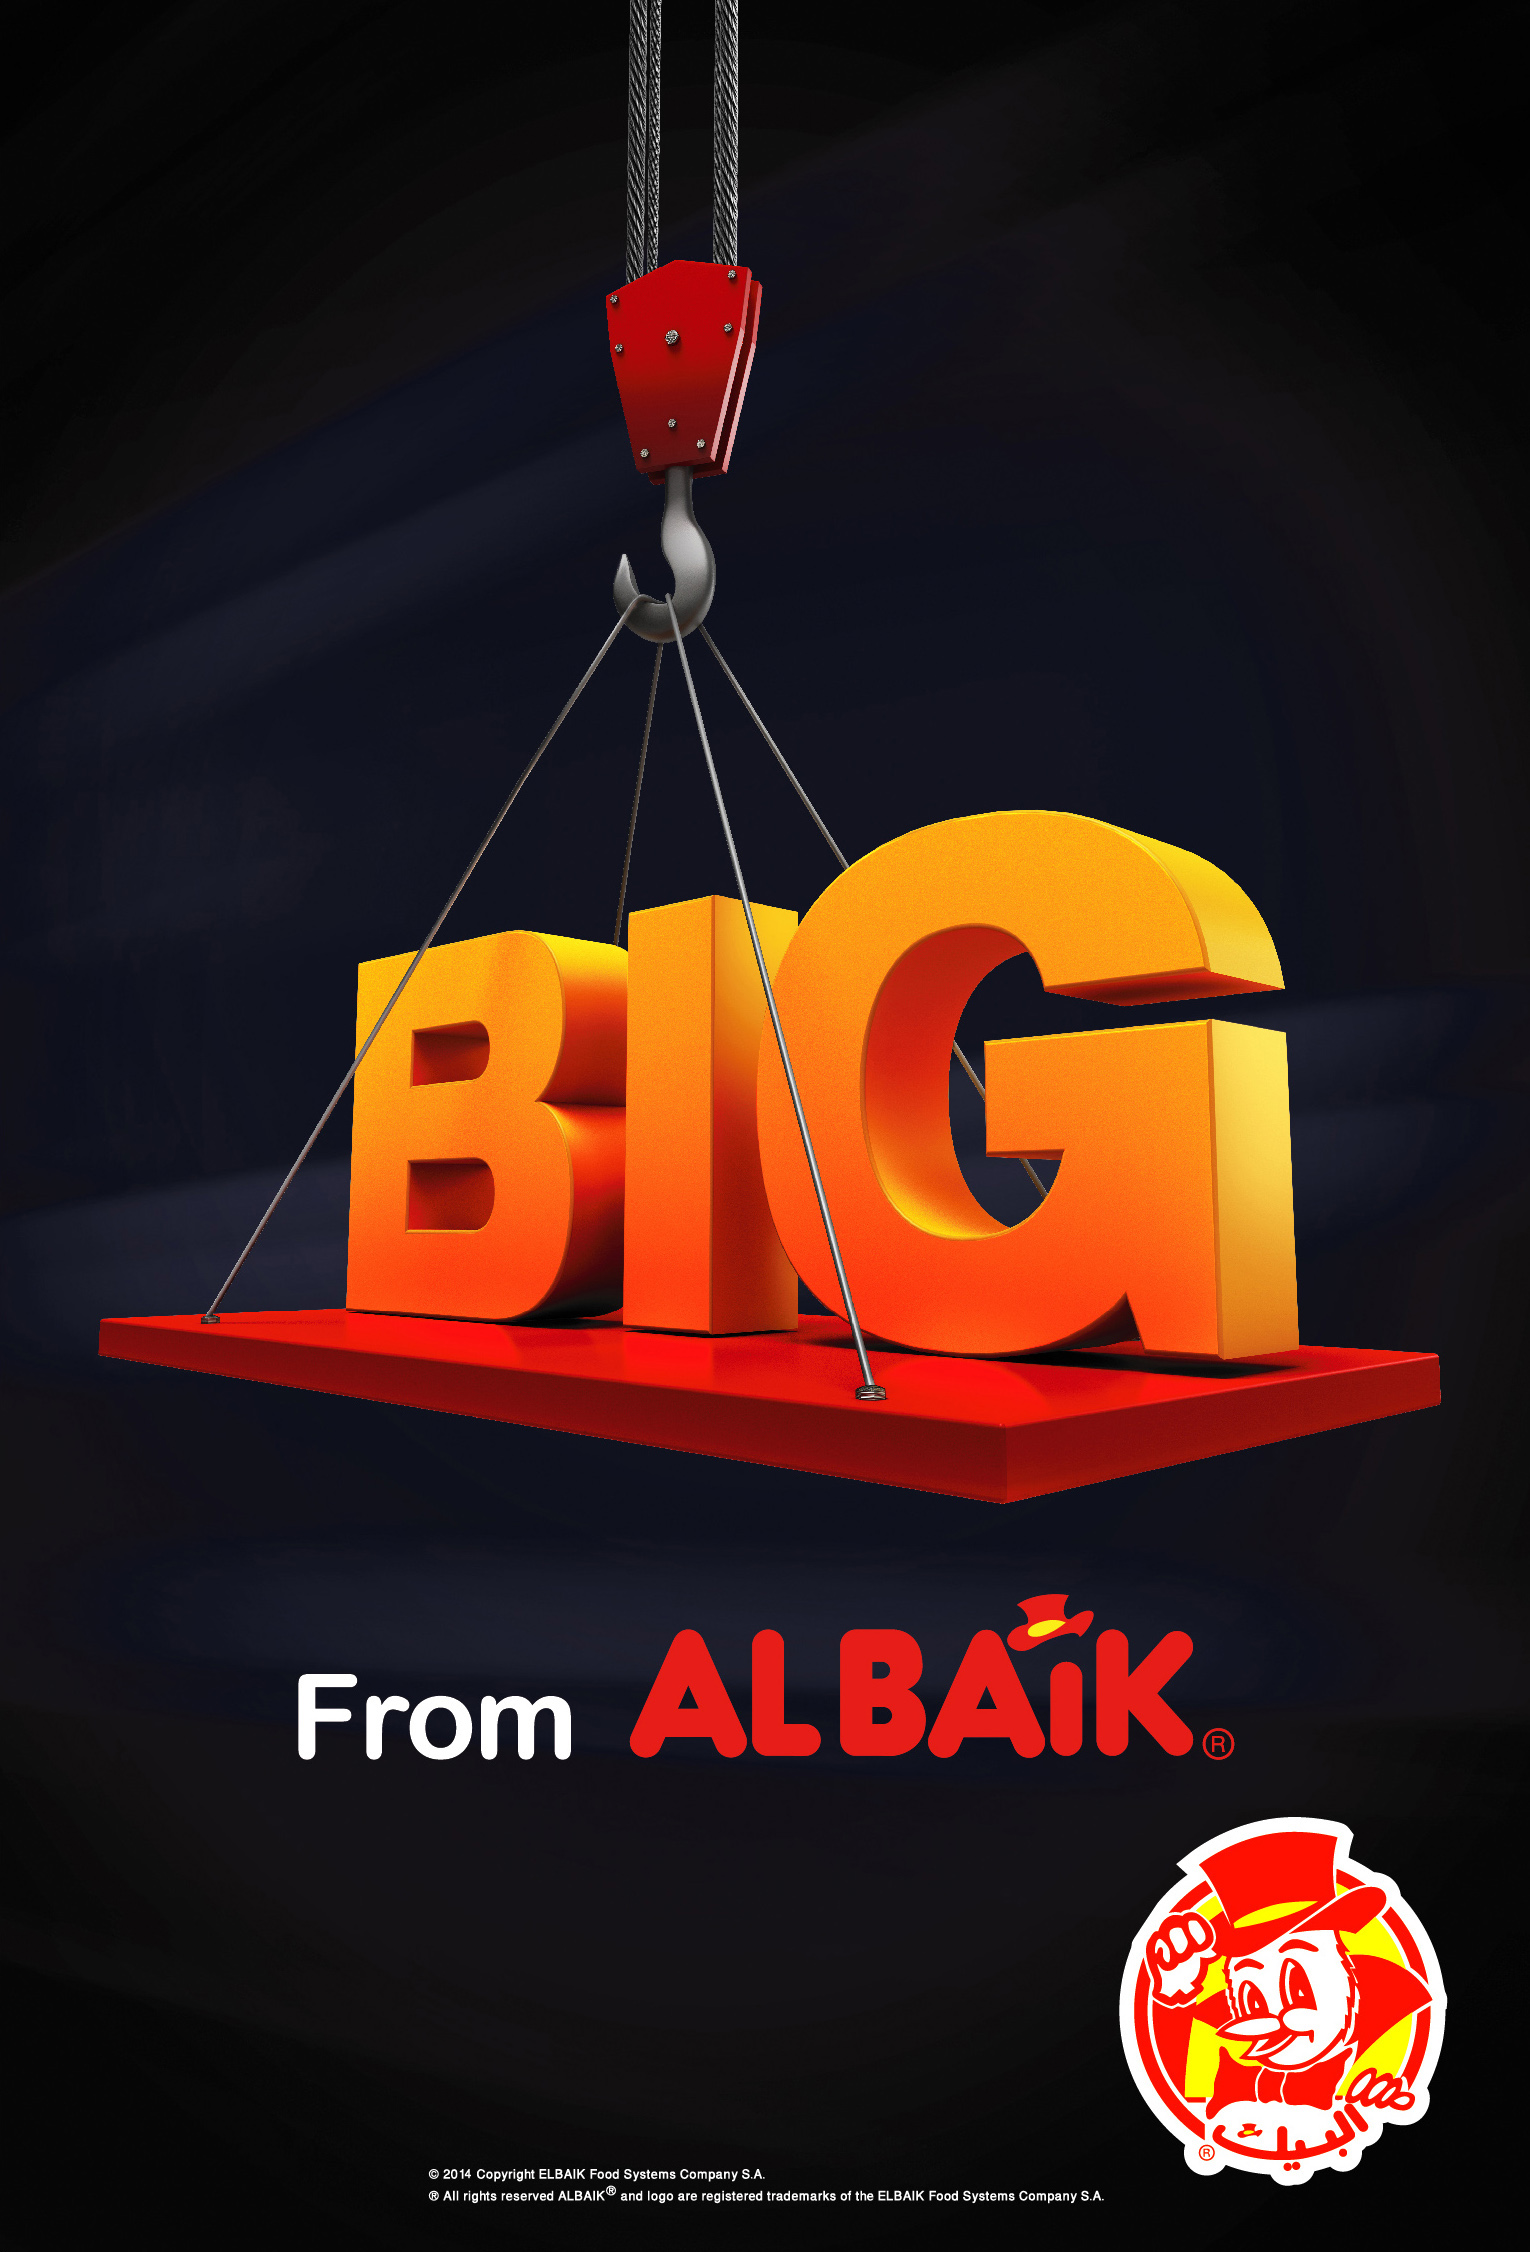 Albaik BIG Eng&Ara Mupi 260x385mm